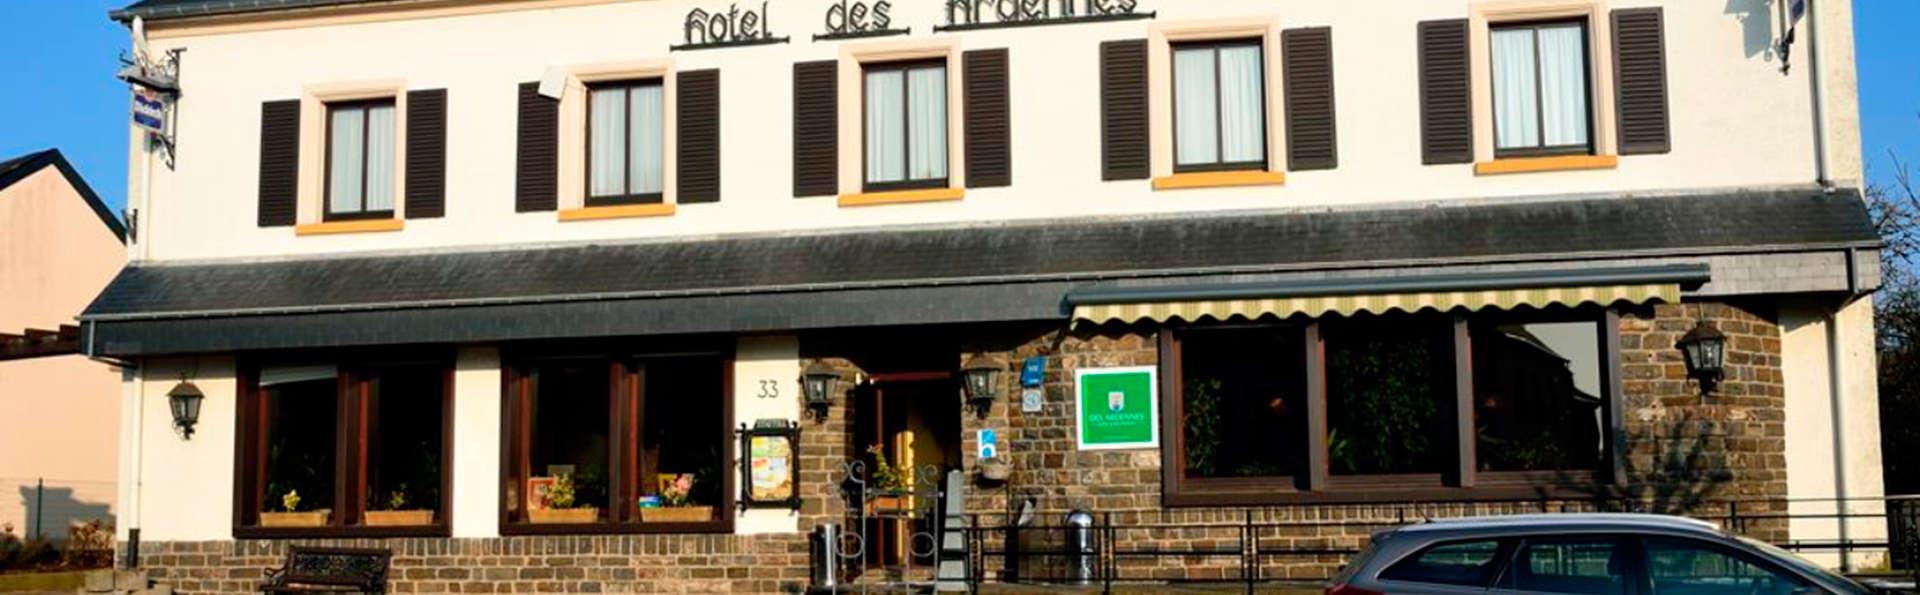 Hotel Des Ardennes - EDIT_front2.jpg